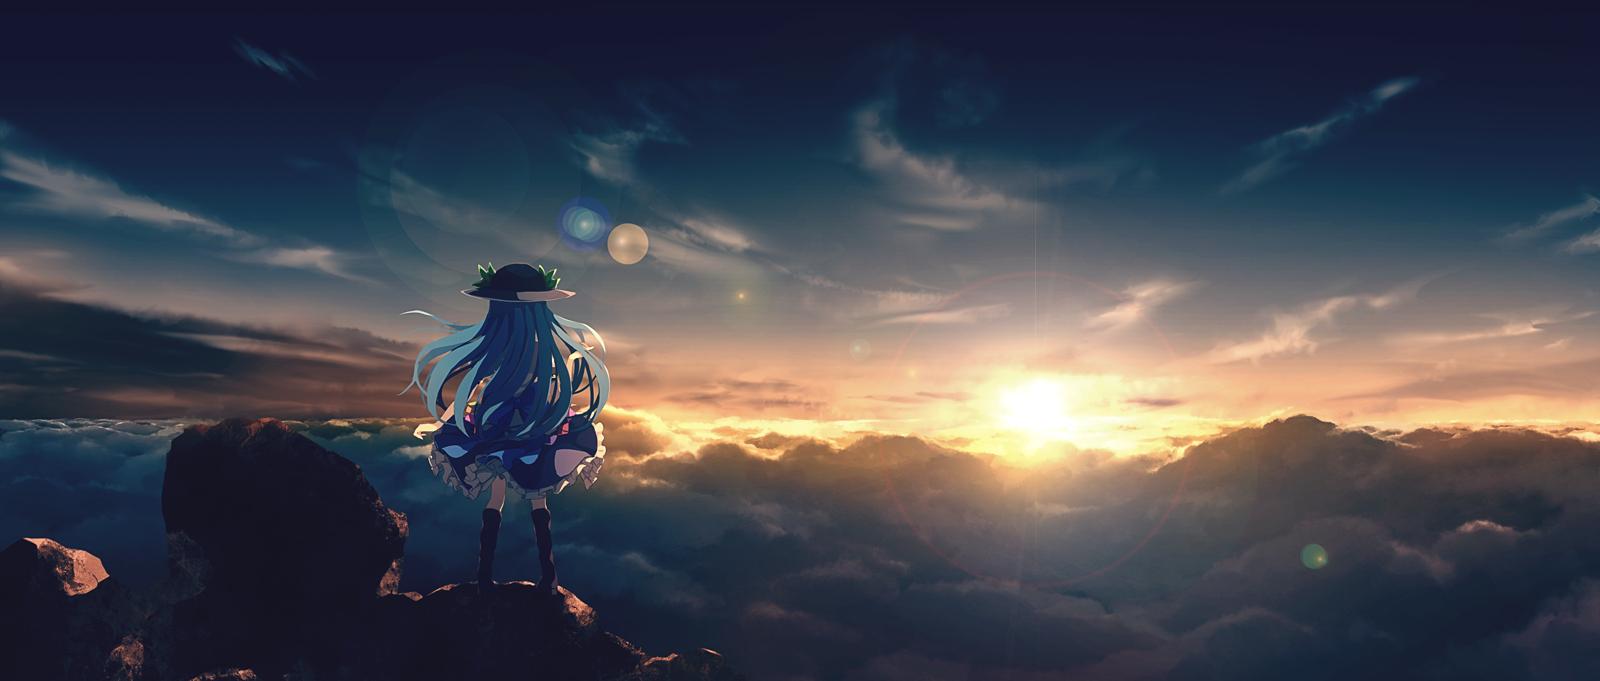 【P站画师】美丽遥远幻想乡!日本画师ぢせ的东方插画作品- ACG17.COM